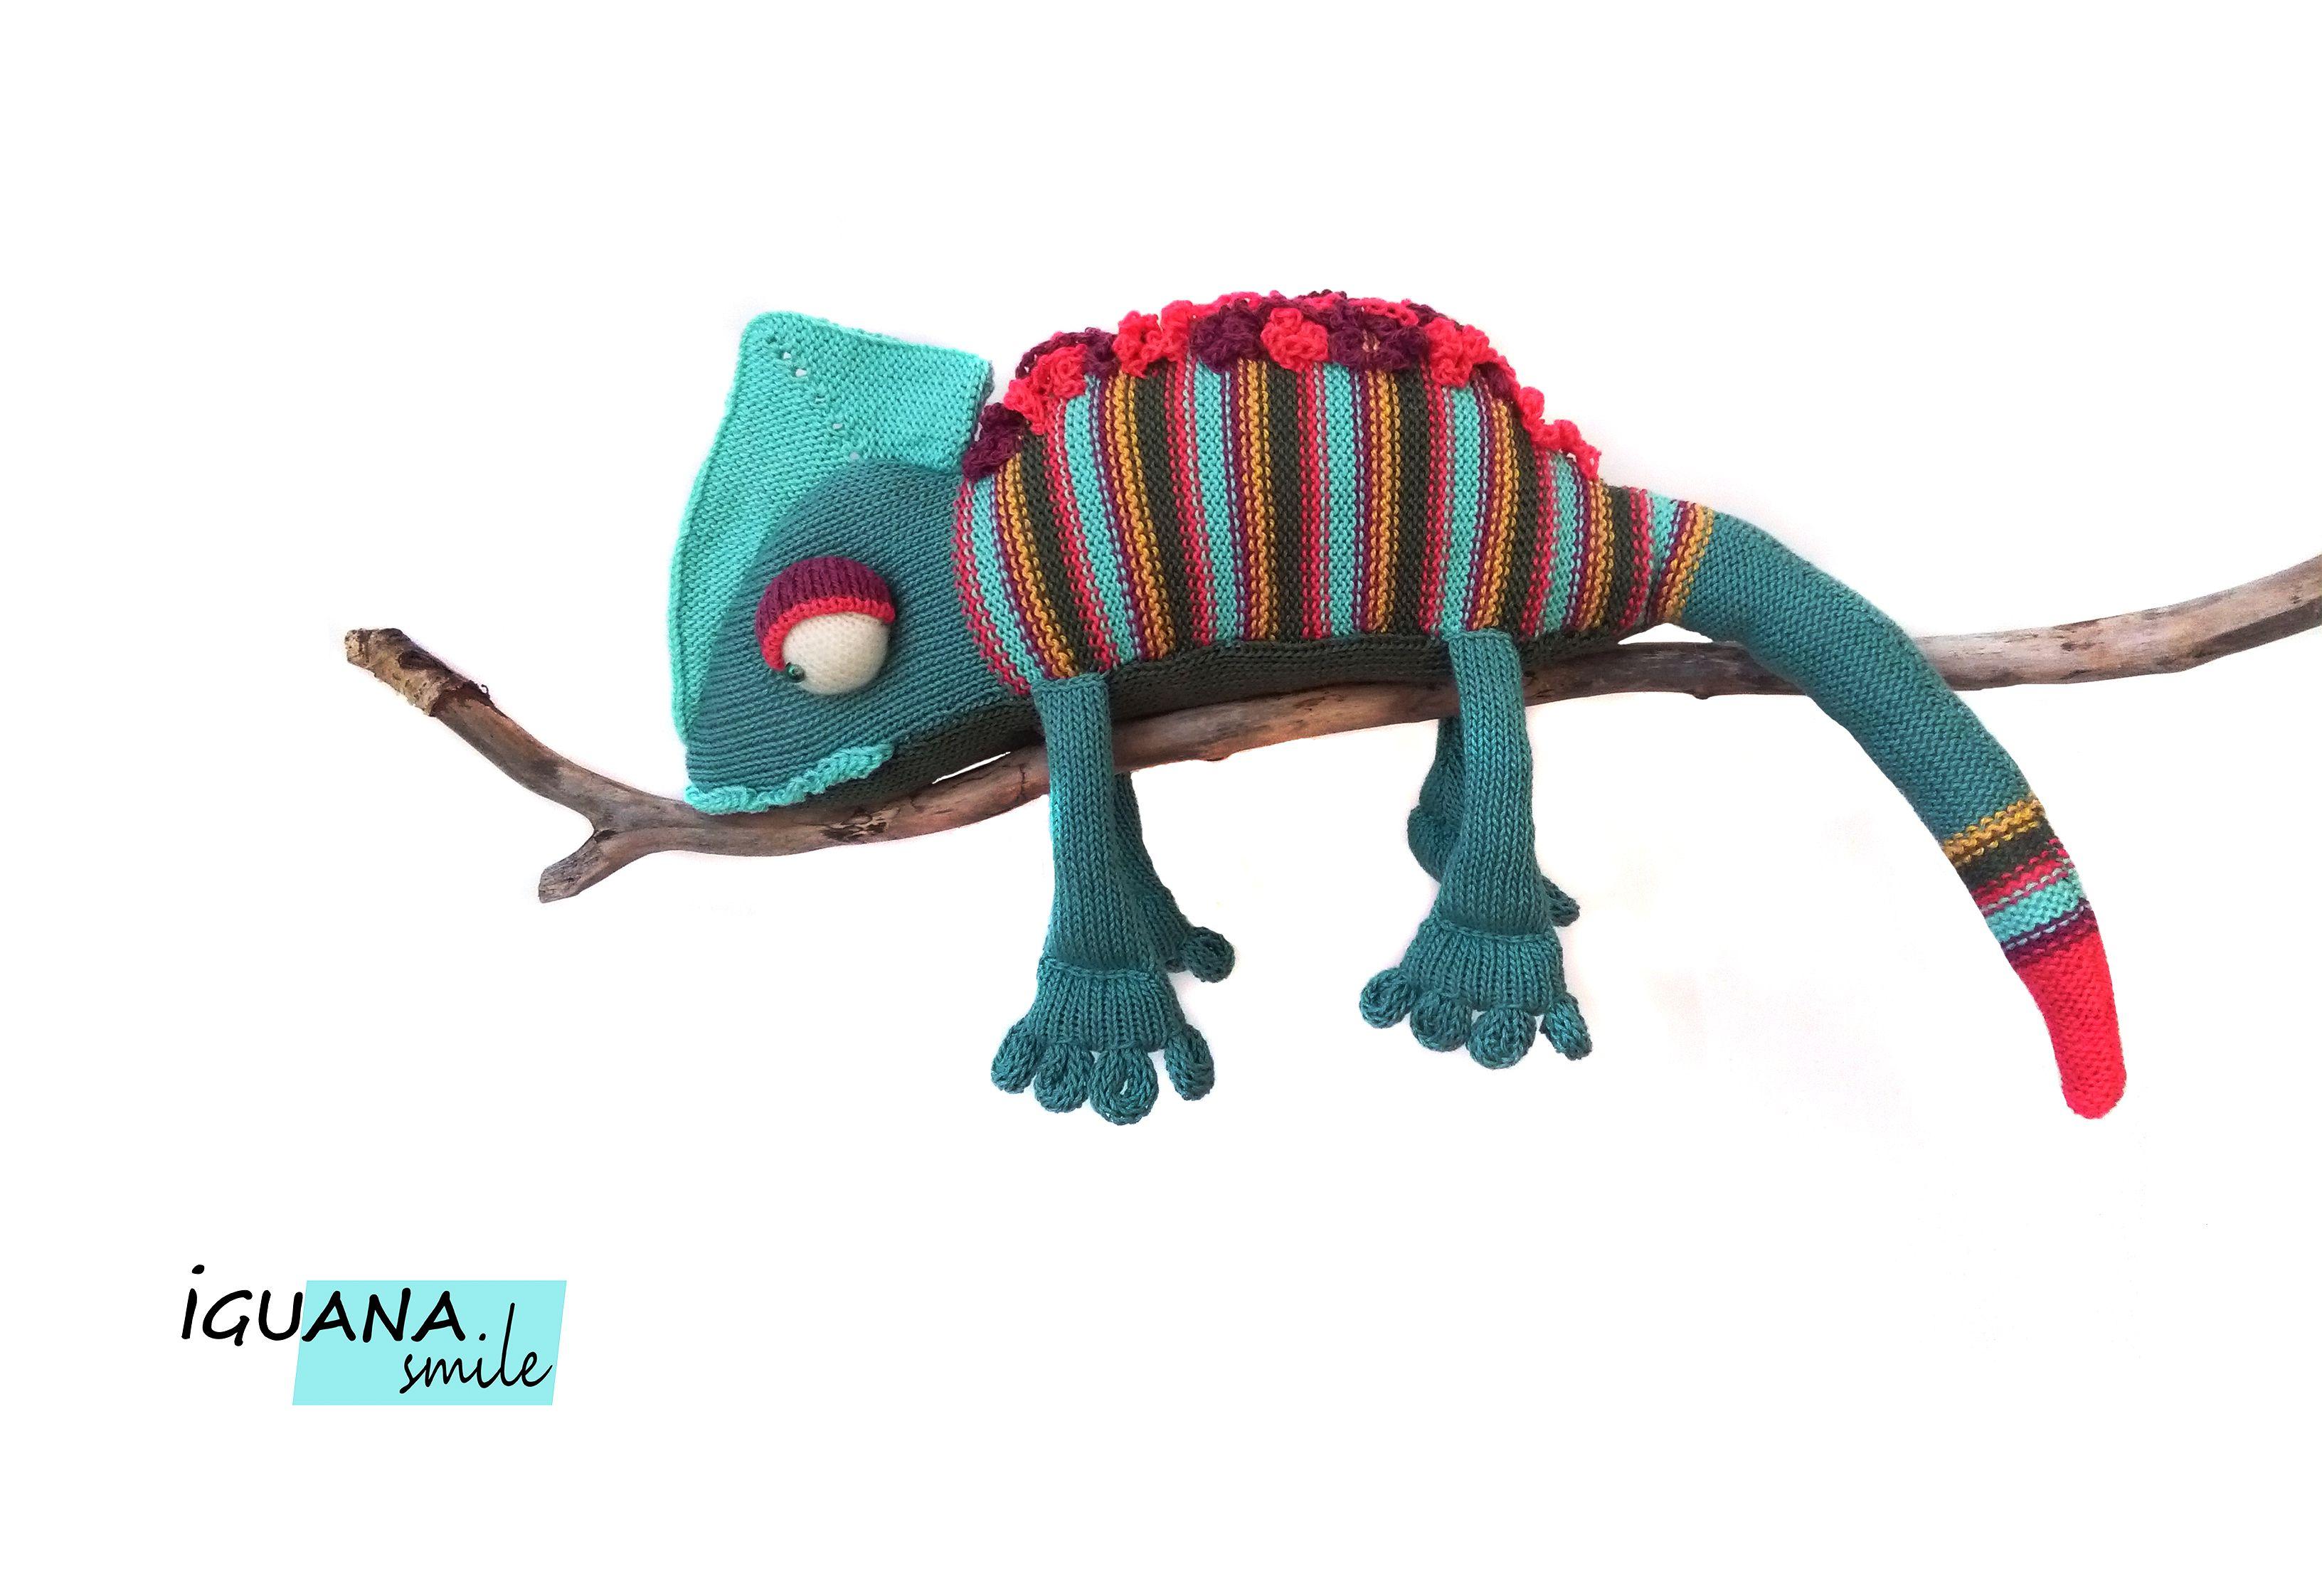 подарок длядетей оригинальныйподарок игуана необычнаяигрушка крутойподарок крутаяигрушка ящерица хамелеон мягкаяигрушка вязанаяигрушка